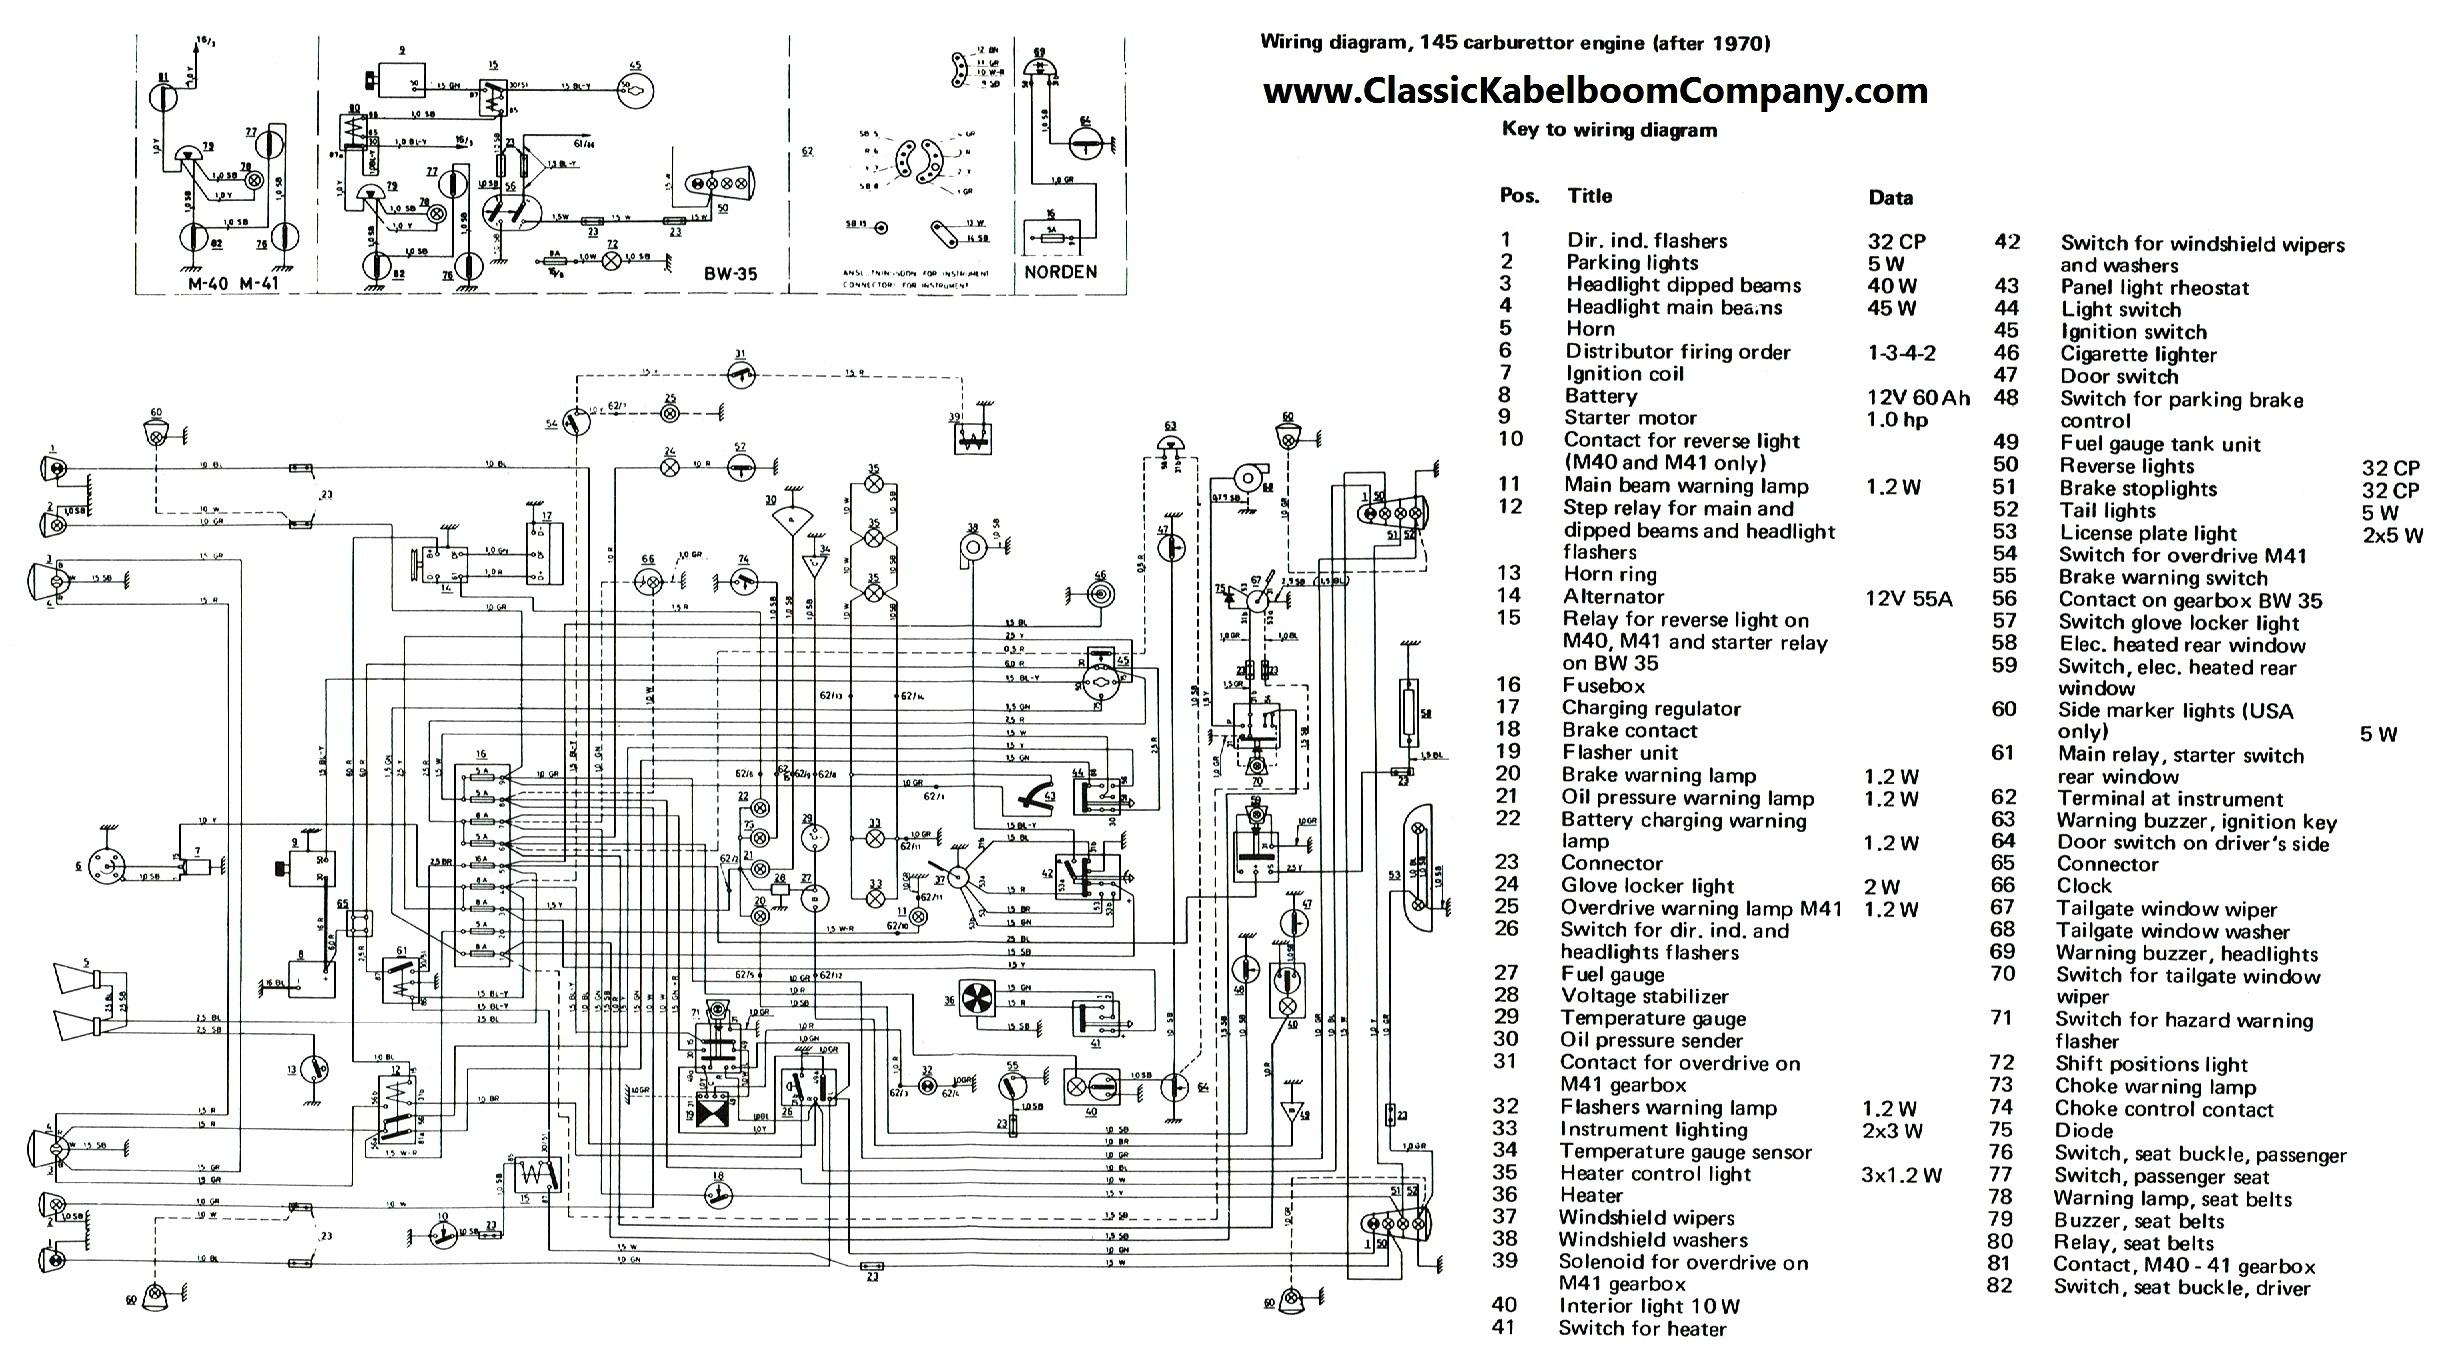 vol20?cdp=a classic kabelboom company elektrisch bedrading schema volvo 1969 Volvo 142 at honlapkeszites.co